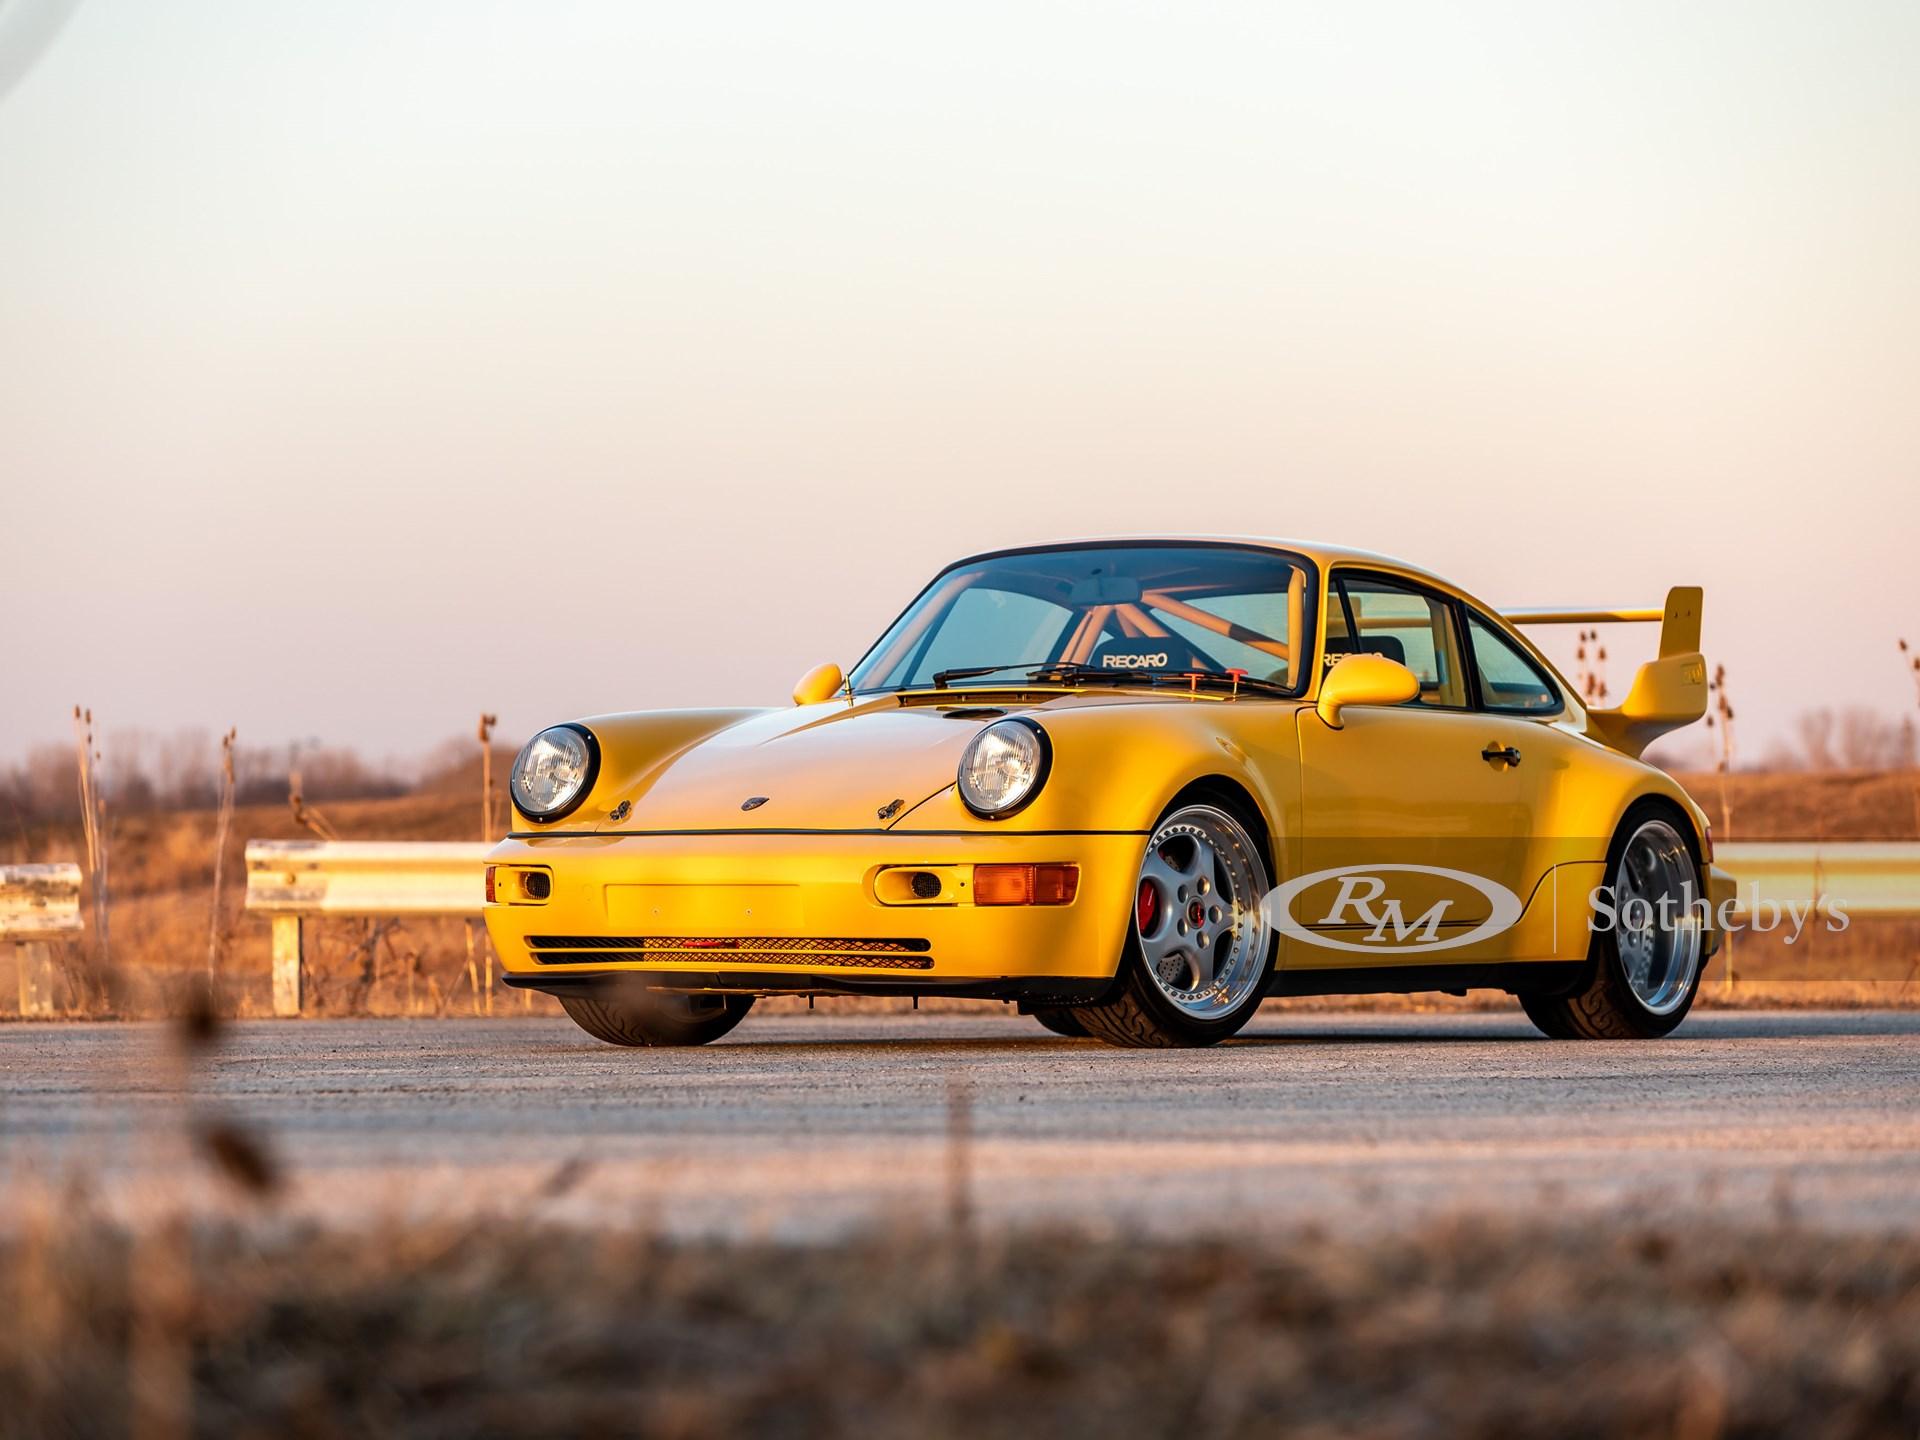 210326 1993 Porsche 911 Carrera RSR 3.8 (Credit – Theodore W. Pieper ©2021 Courtesy of RM Sotheby's)